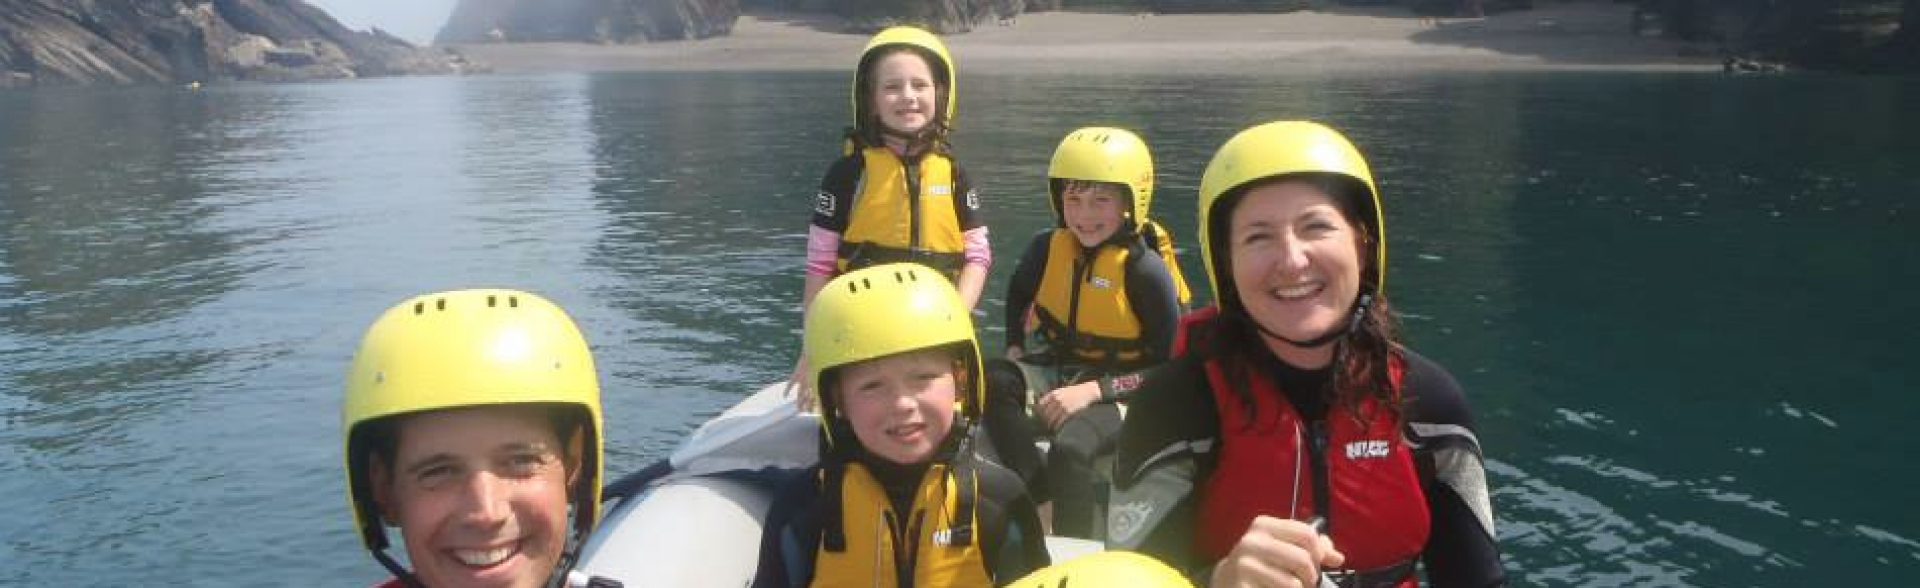 Coastal Rafting